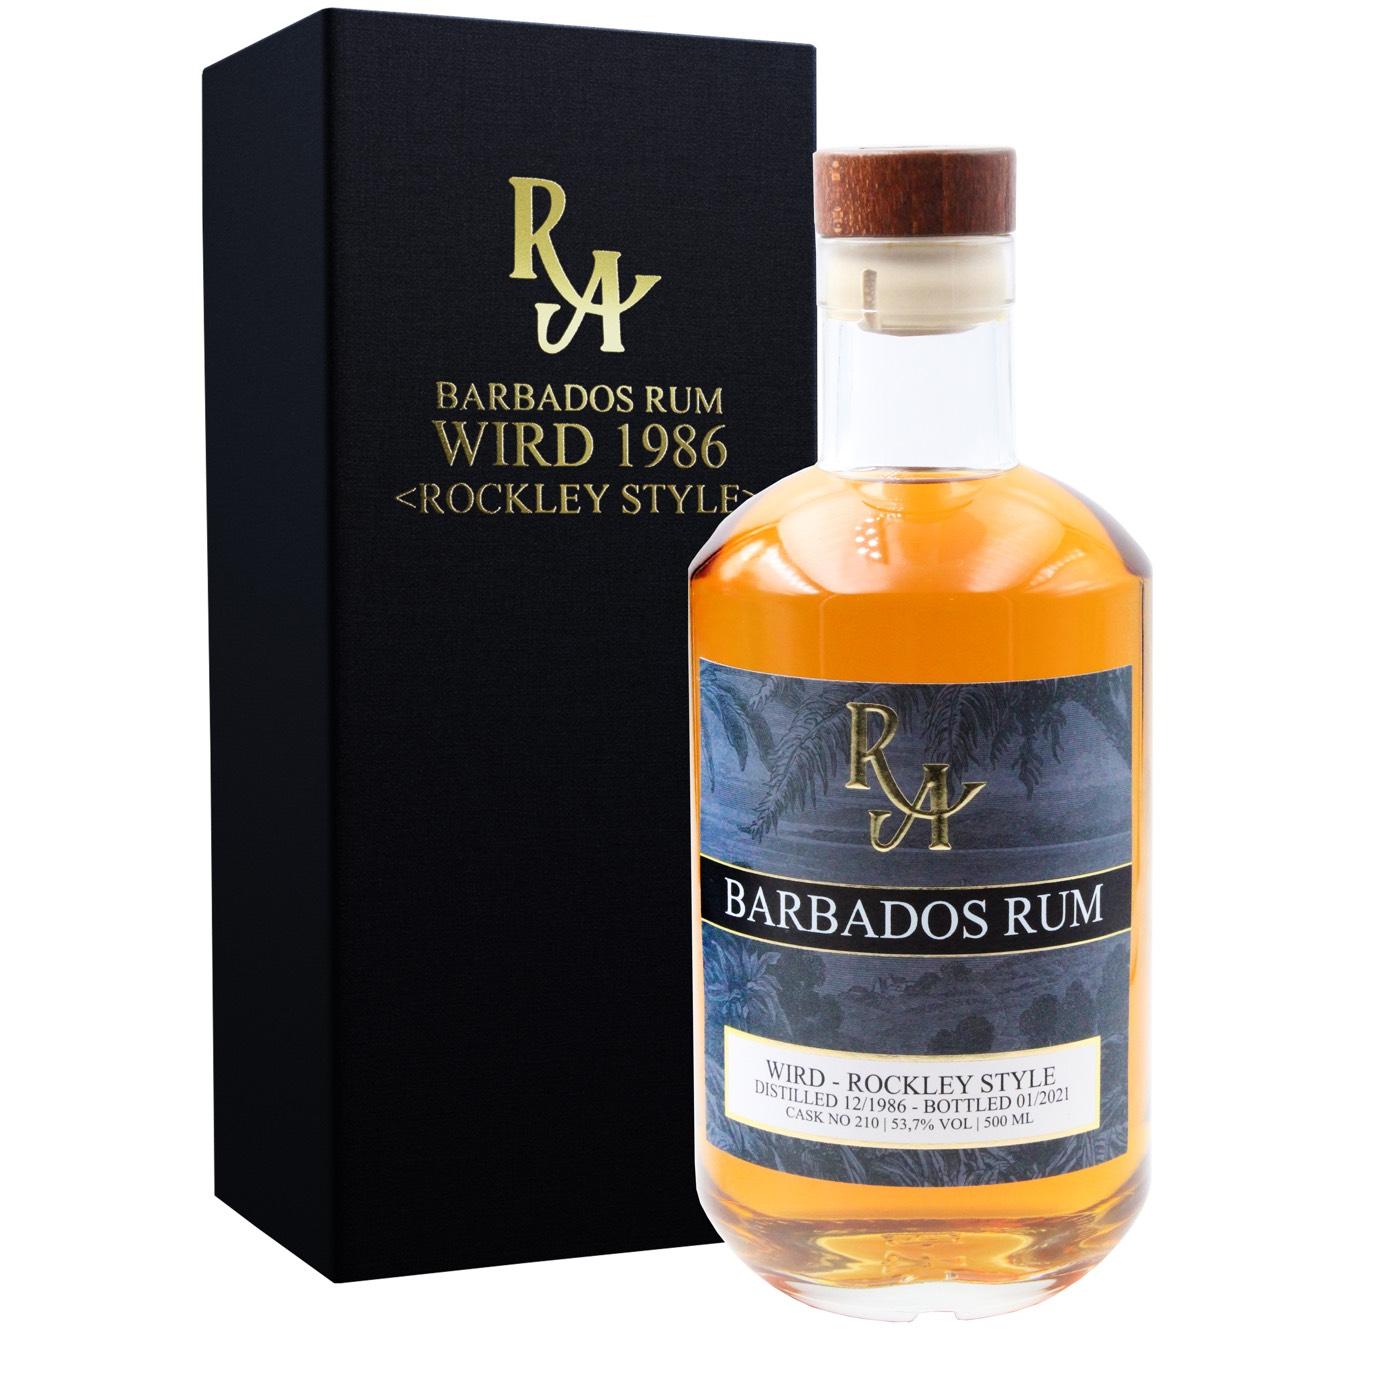 Bottle image of Rum Artesanal Barbados Rum Rockley Style BBR